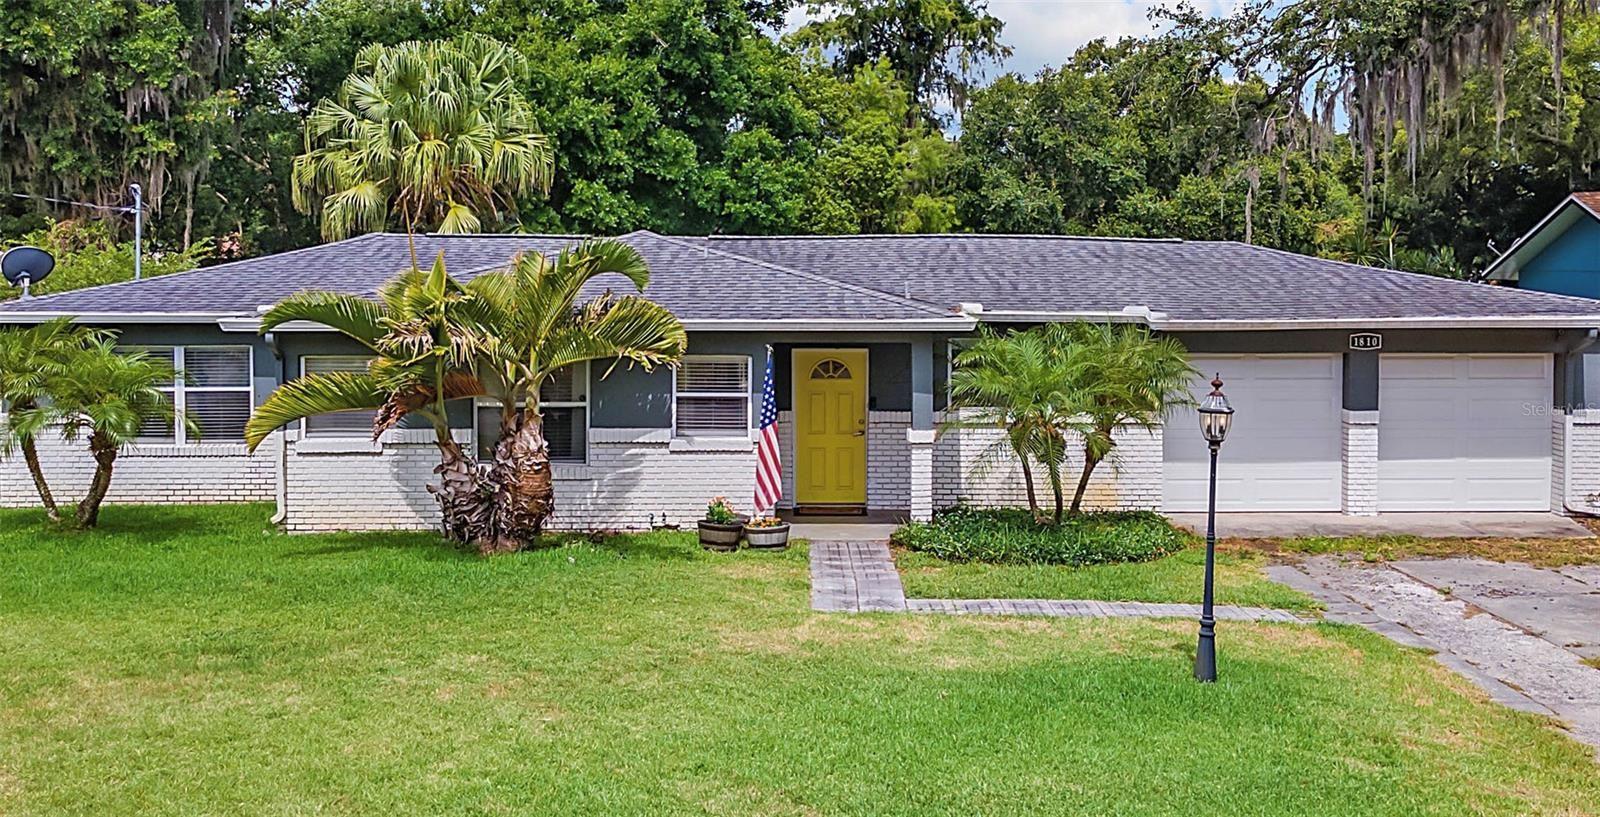 1810 CHAMBERLIN STREET, Orlando, FL 32806 - #: O5949943